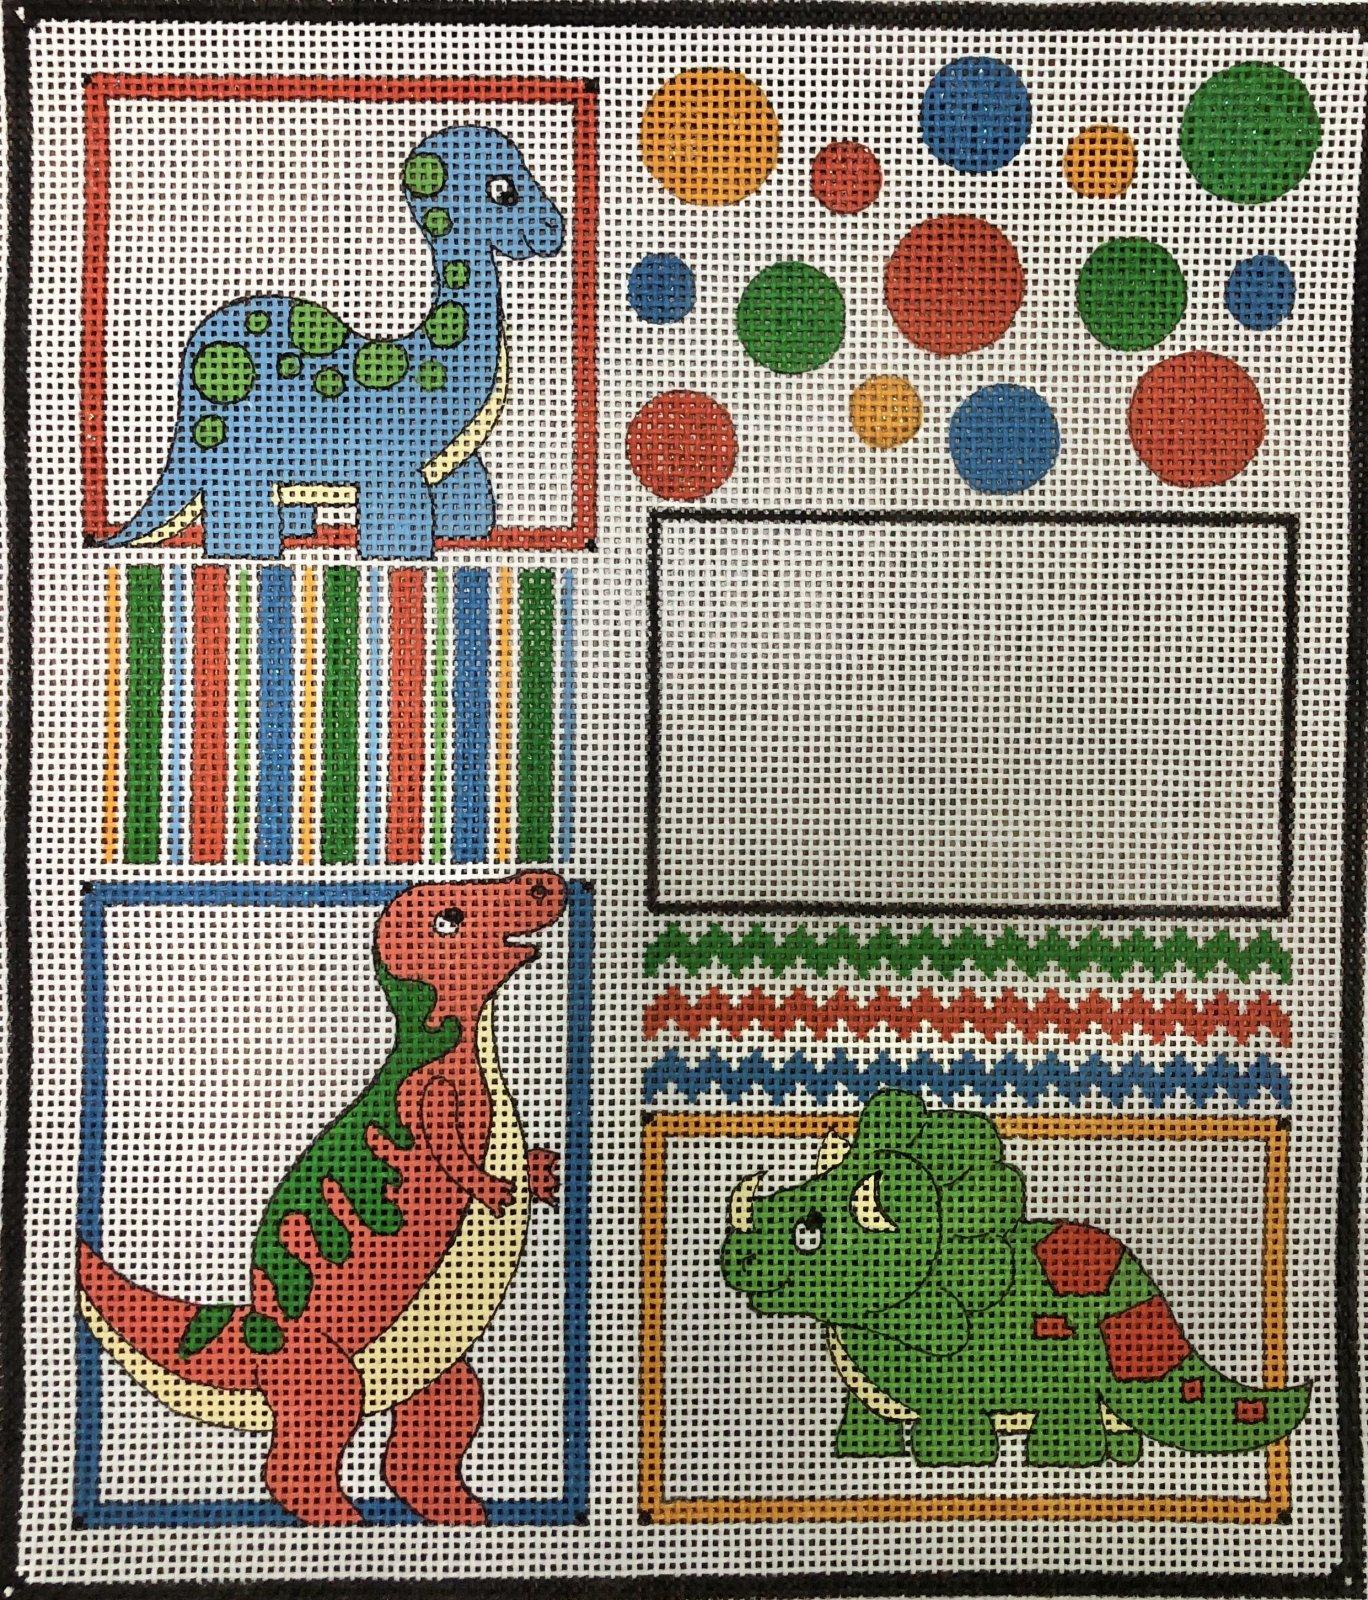 PC-Dinos & Patterns  9.5 x 11.5  13M